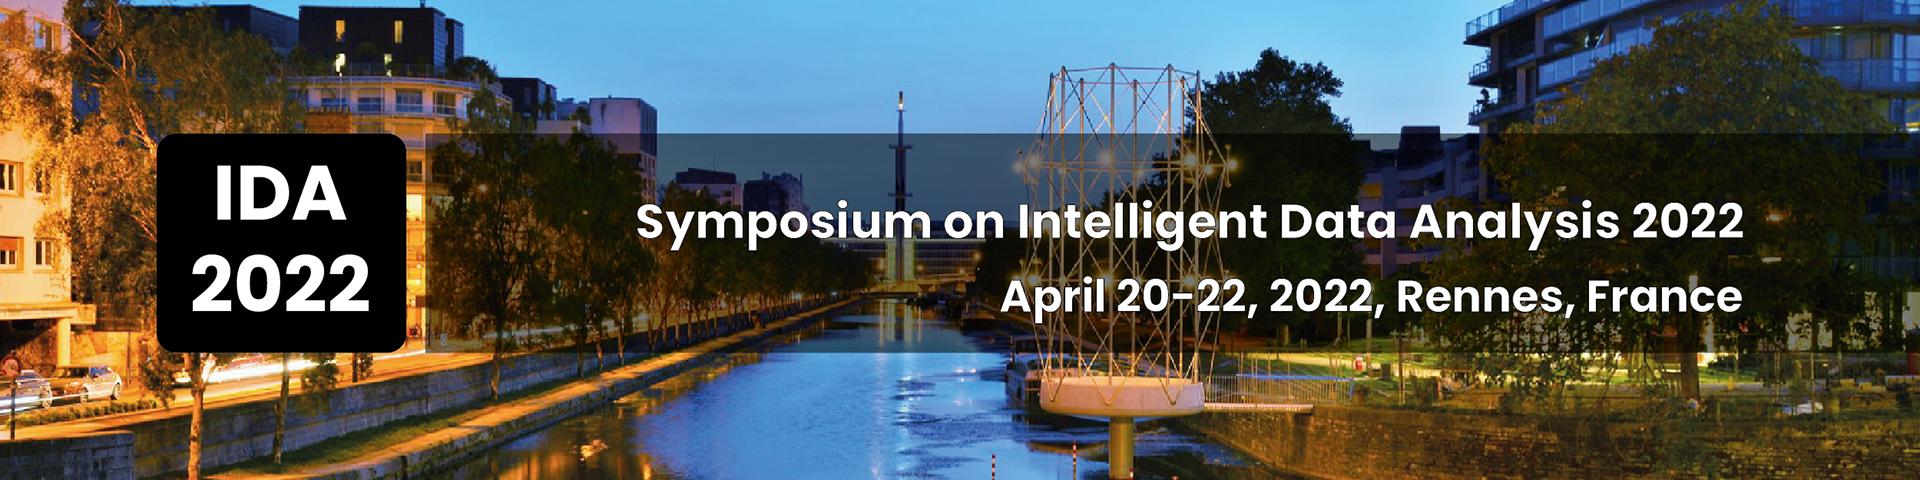 Symposium on Intelligent Data Analysis 2022